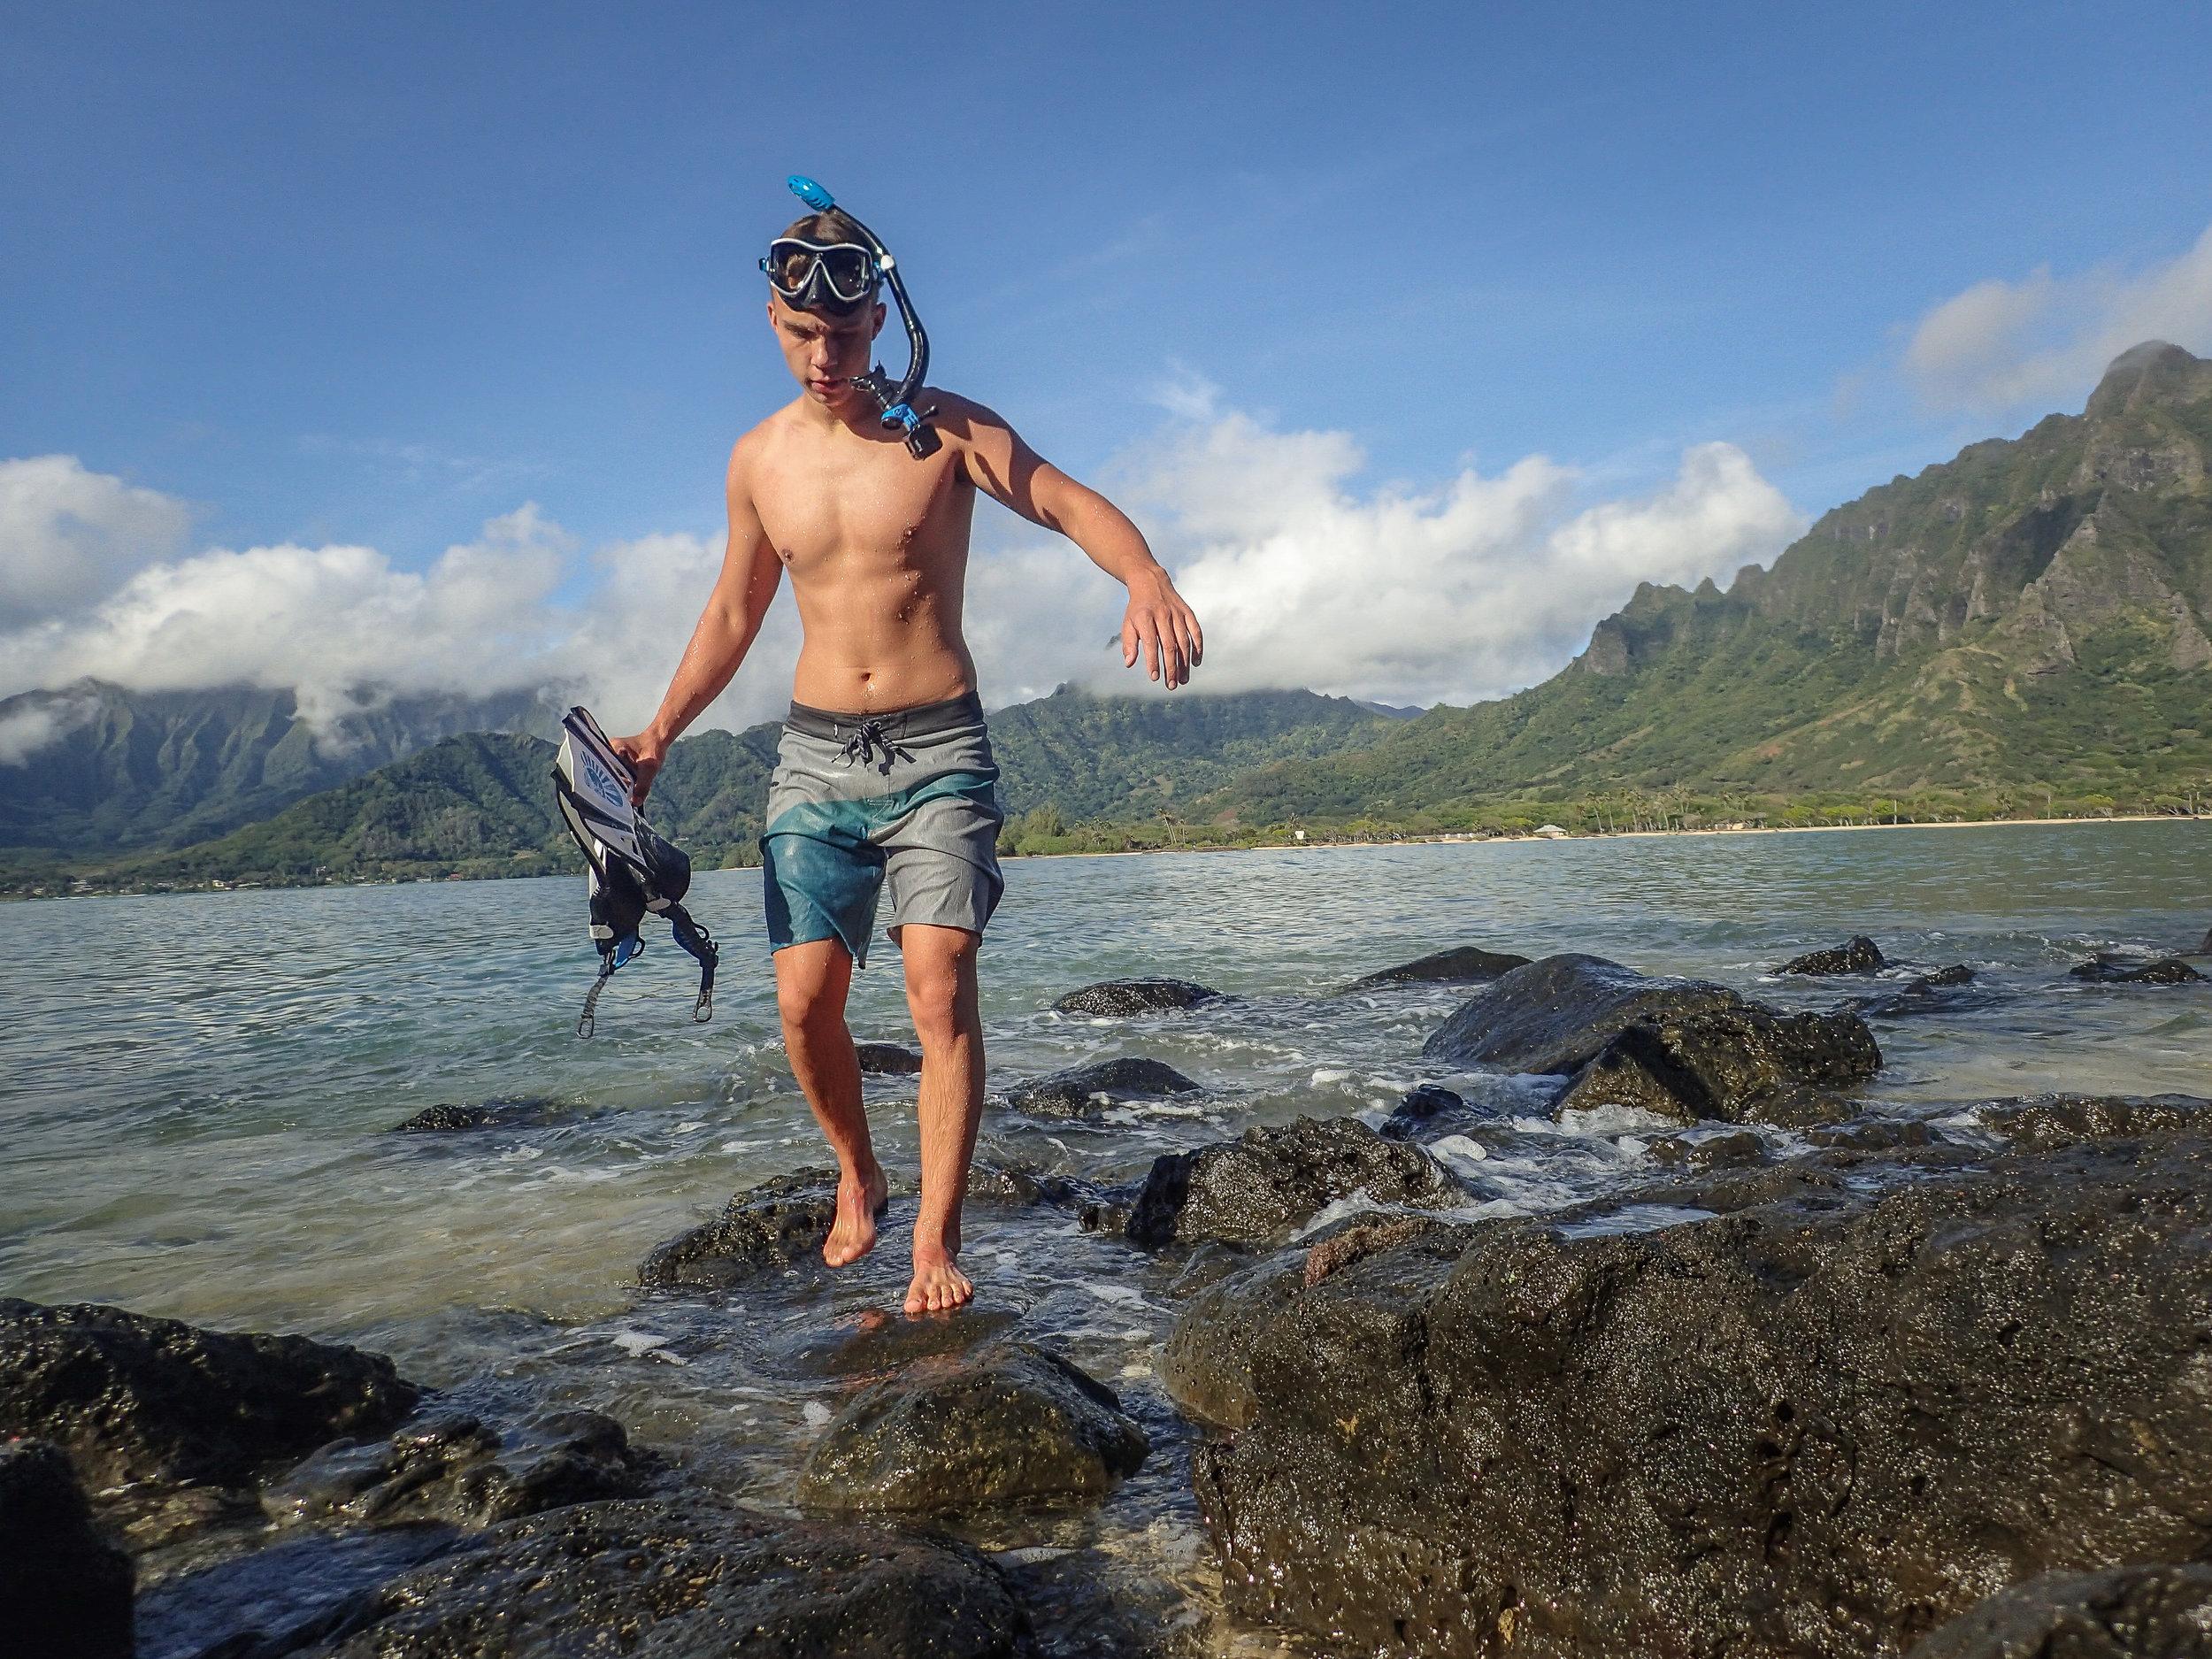 P_Tr_HI_Oahu_Olympus Images-239.jpg